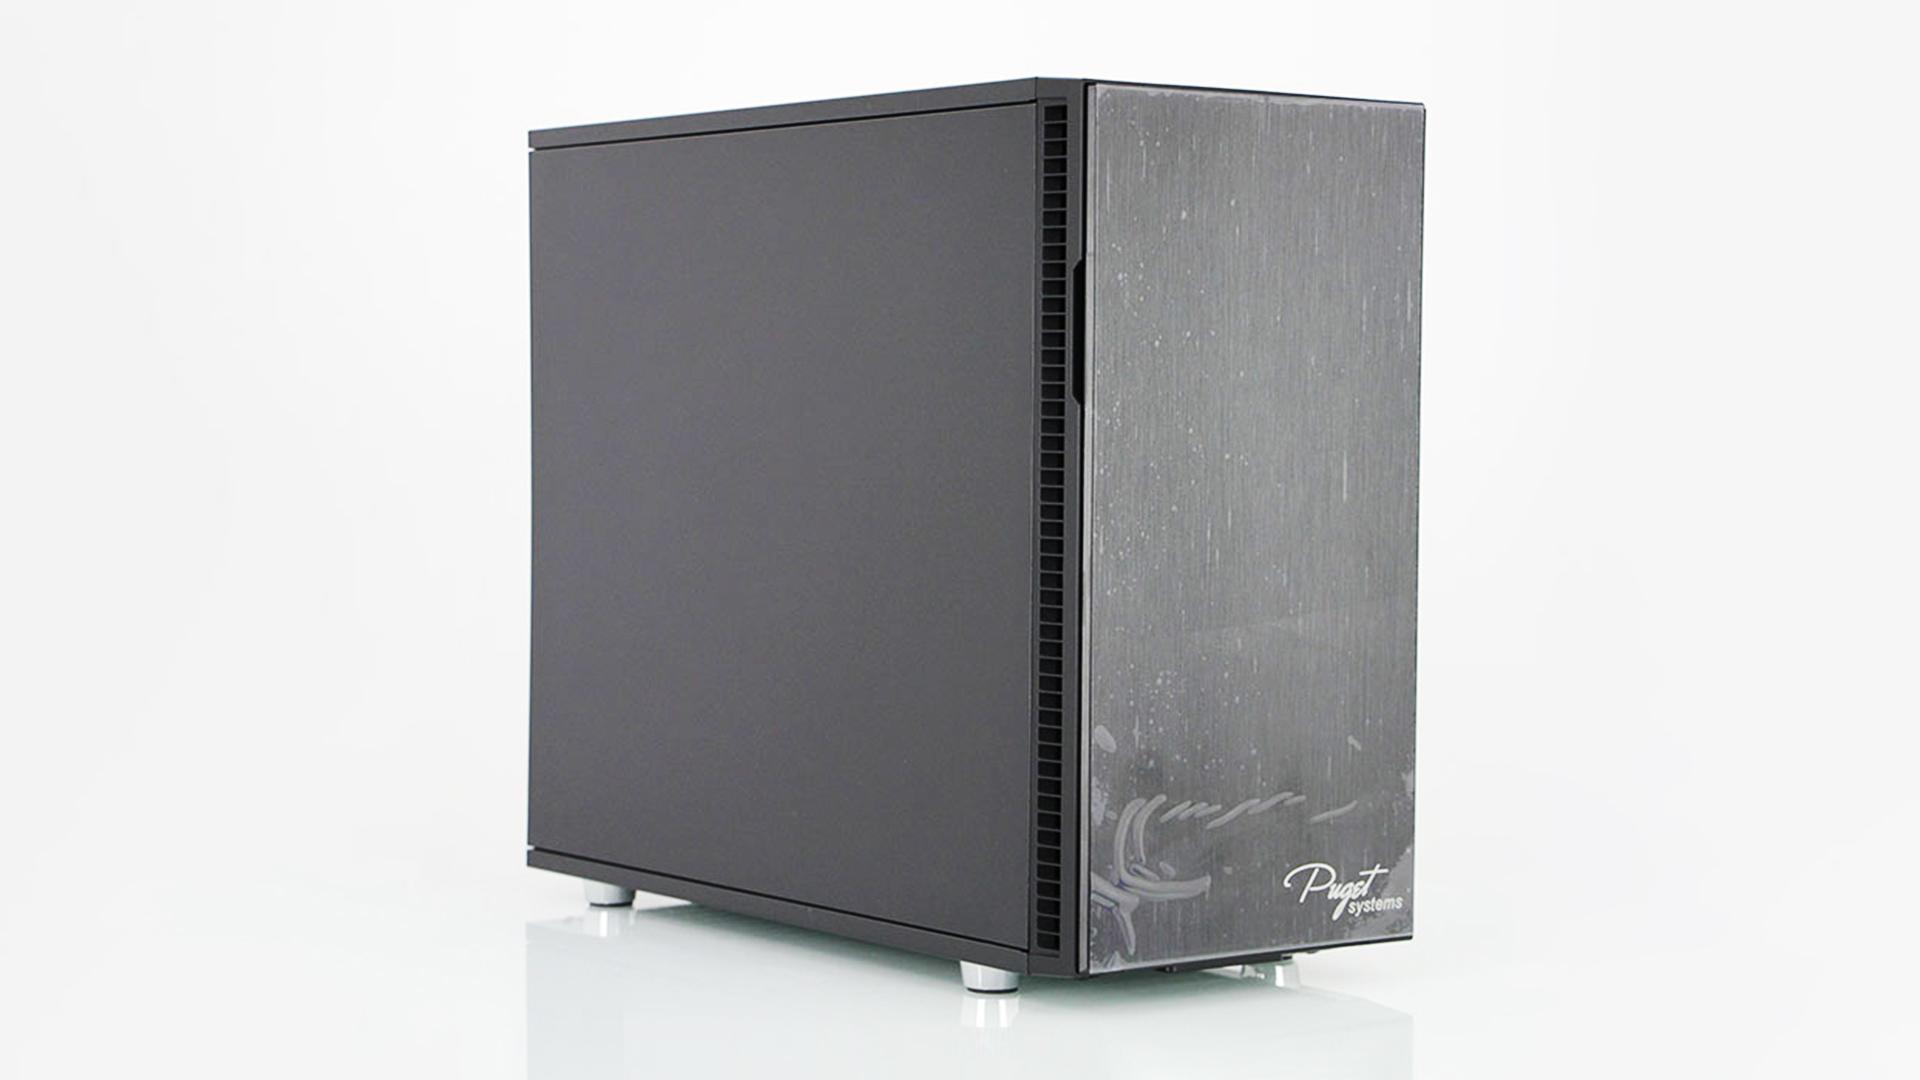 Puget Systems Genesis custom editing PC